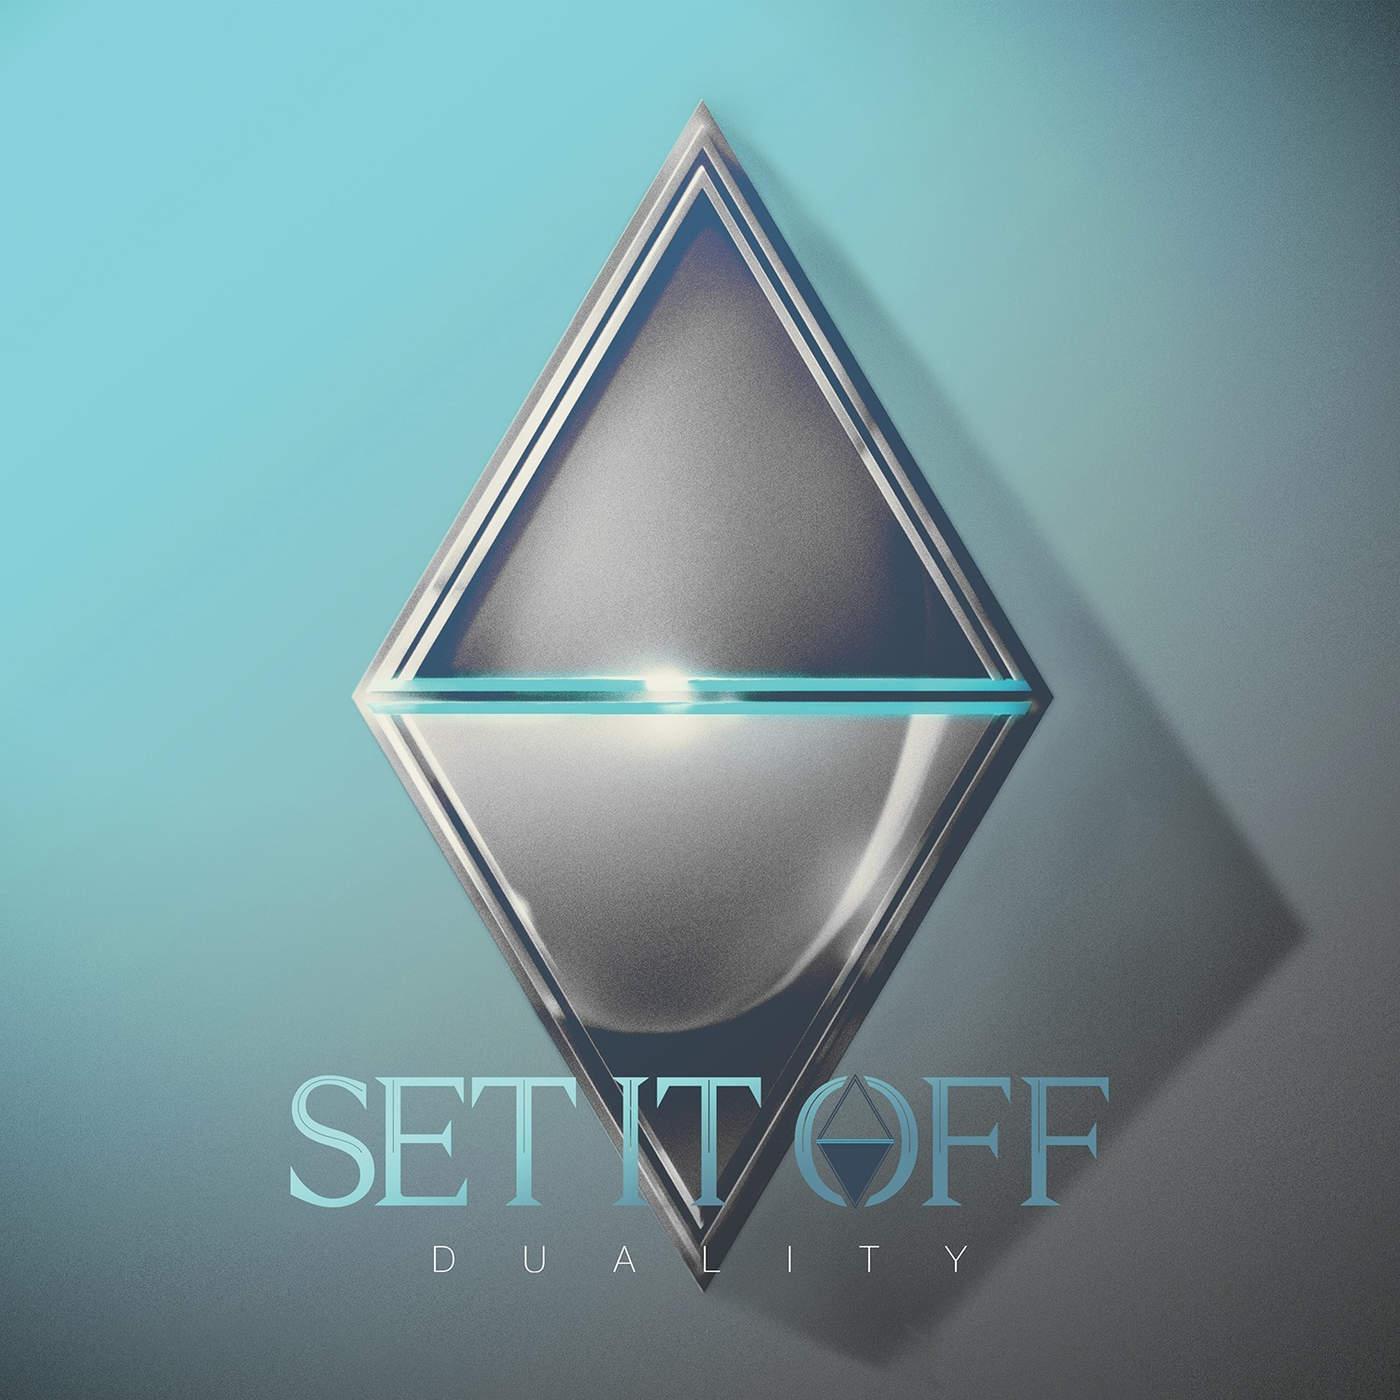 Set It Off - Duality (2014)